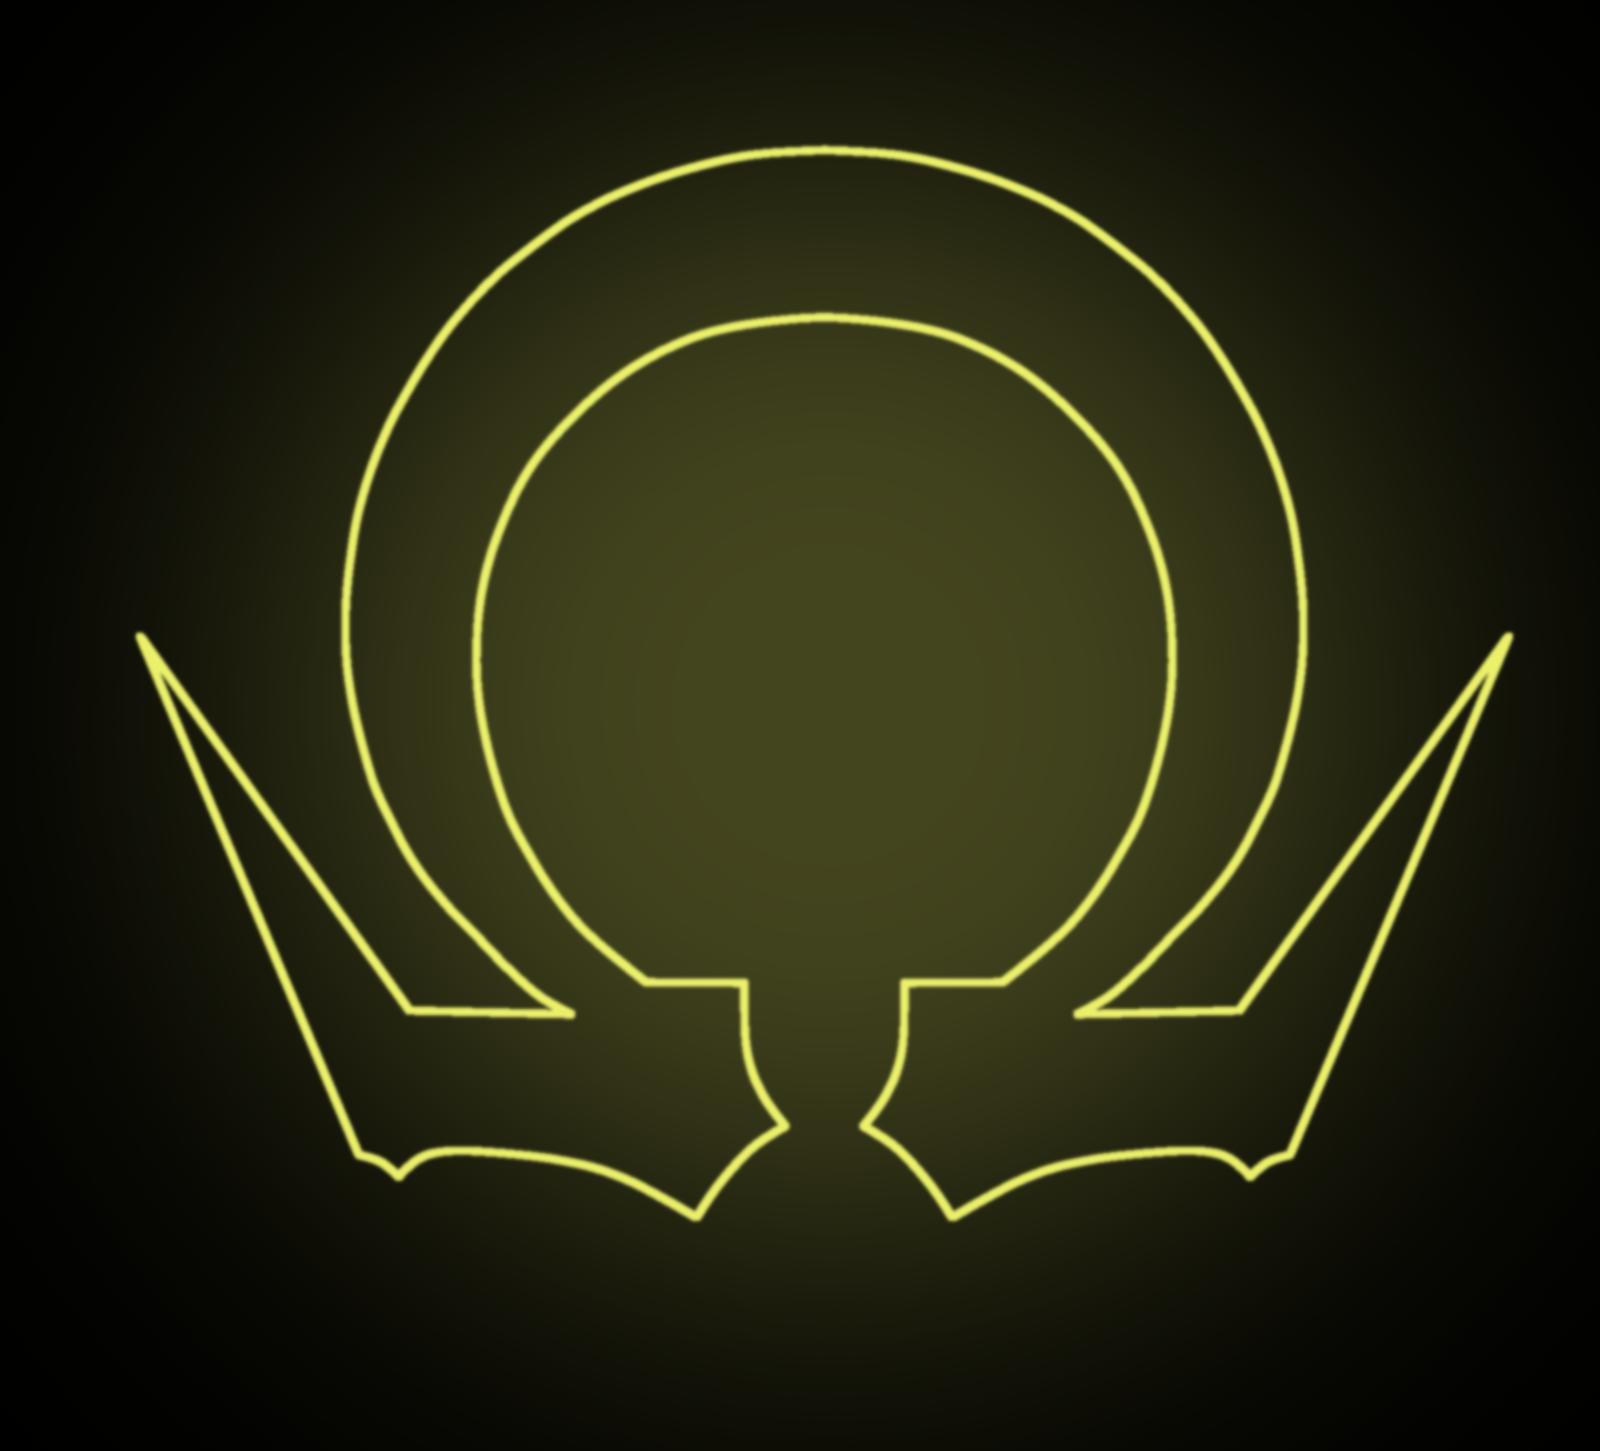 Omega Logos